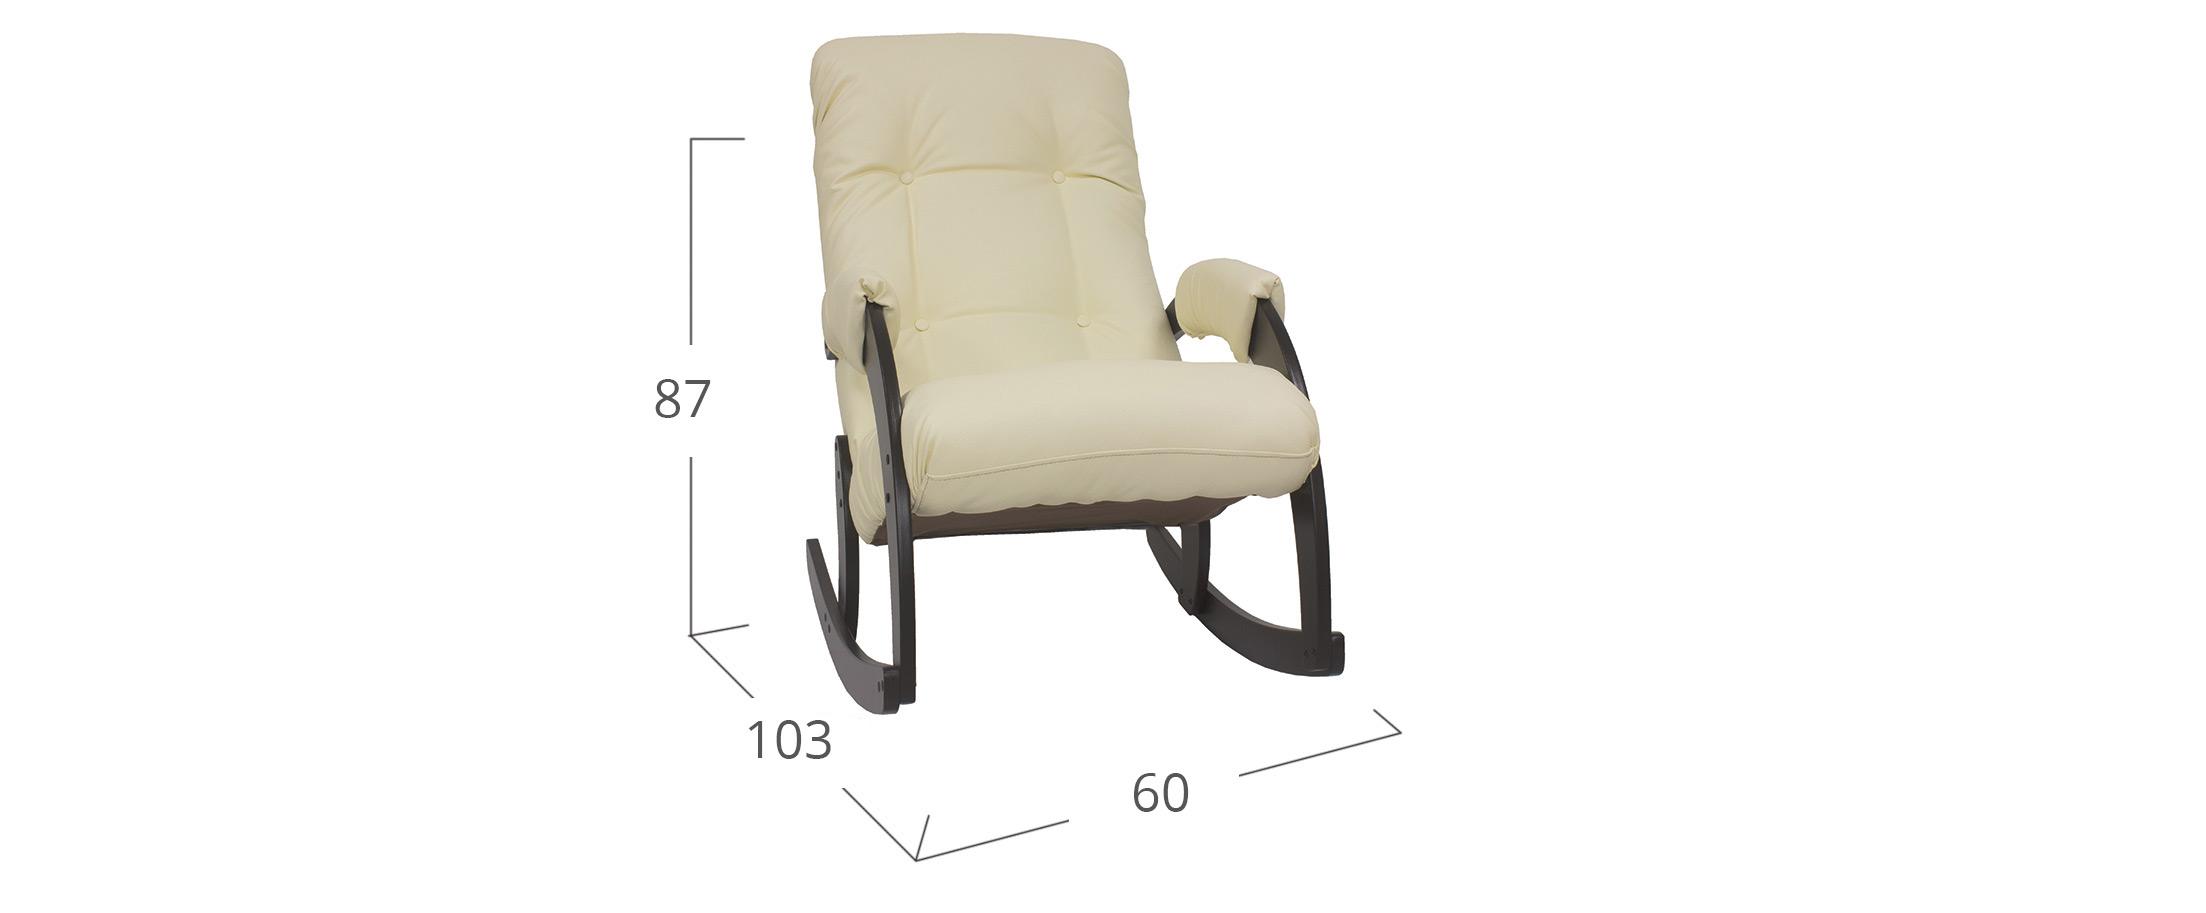 Кресло-качалка 67 Polaris Beige Венге Модель 364